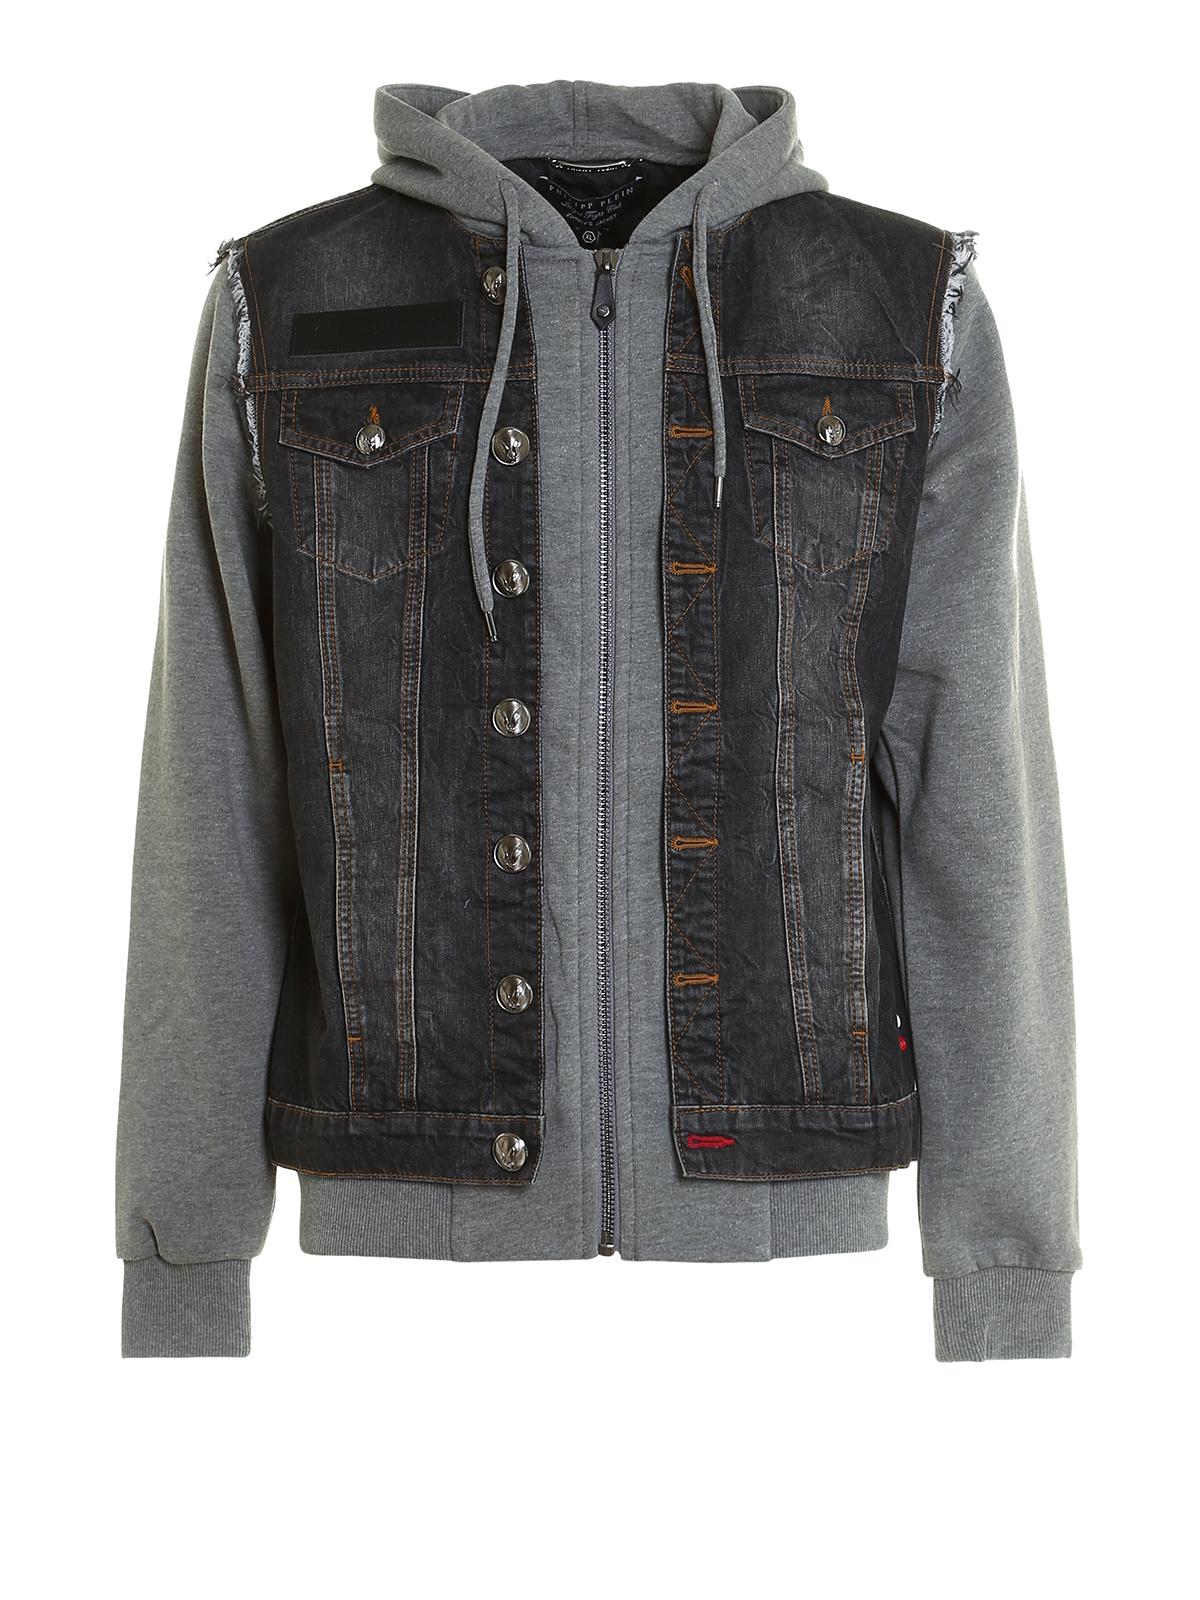 Mirrow denim and jersey jacket by Philipp Plein